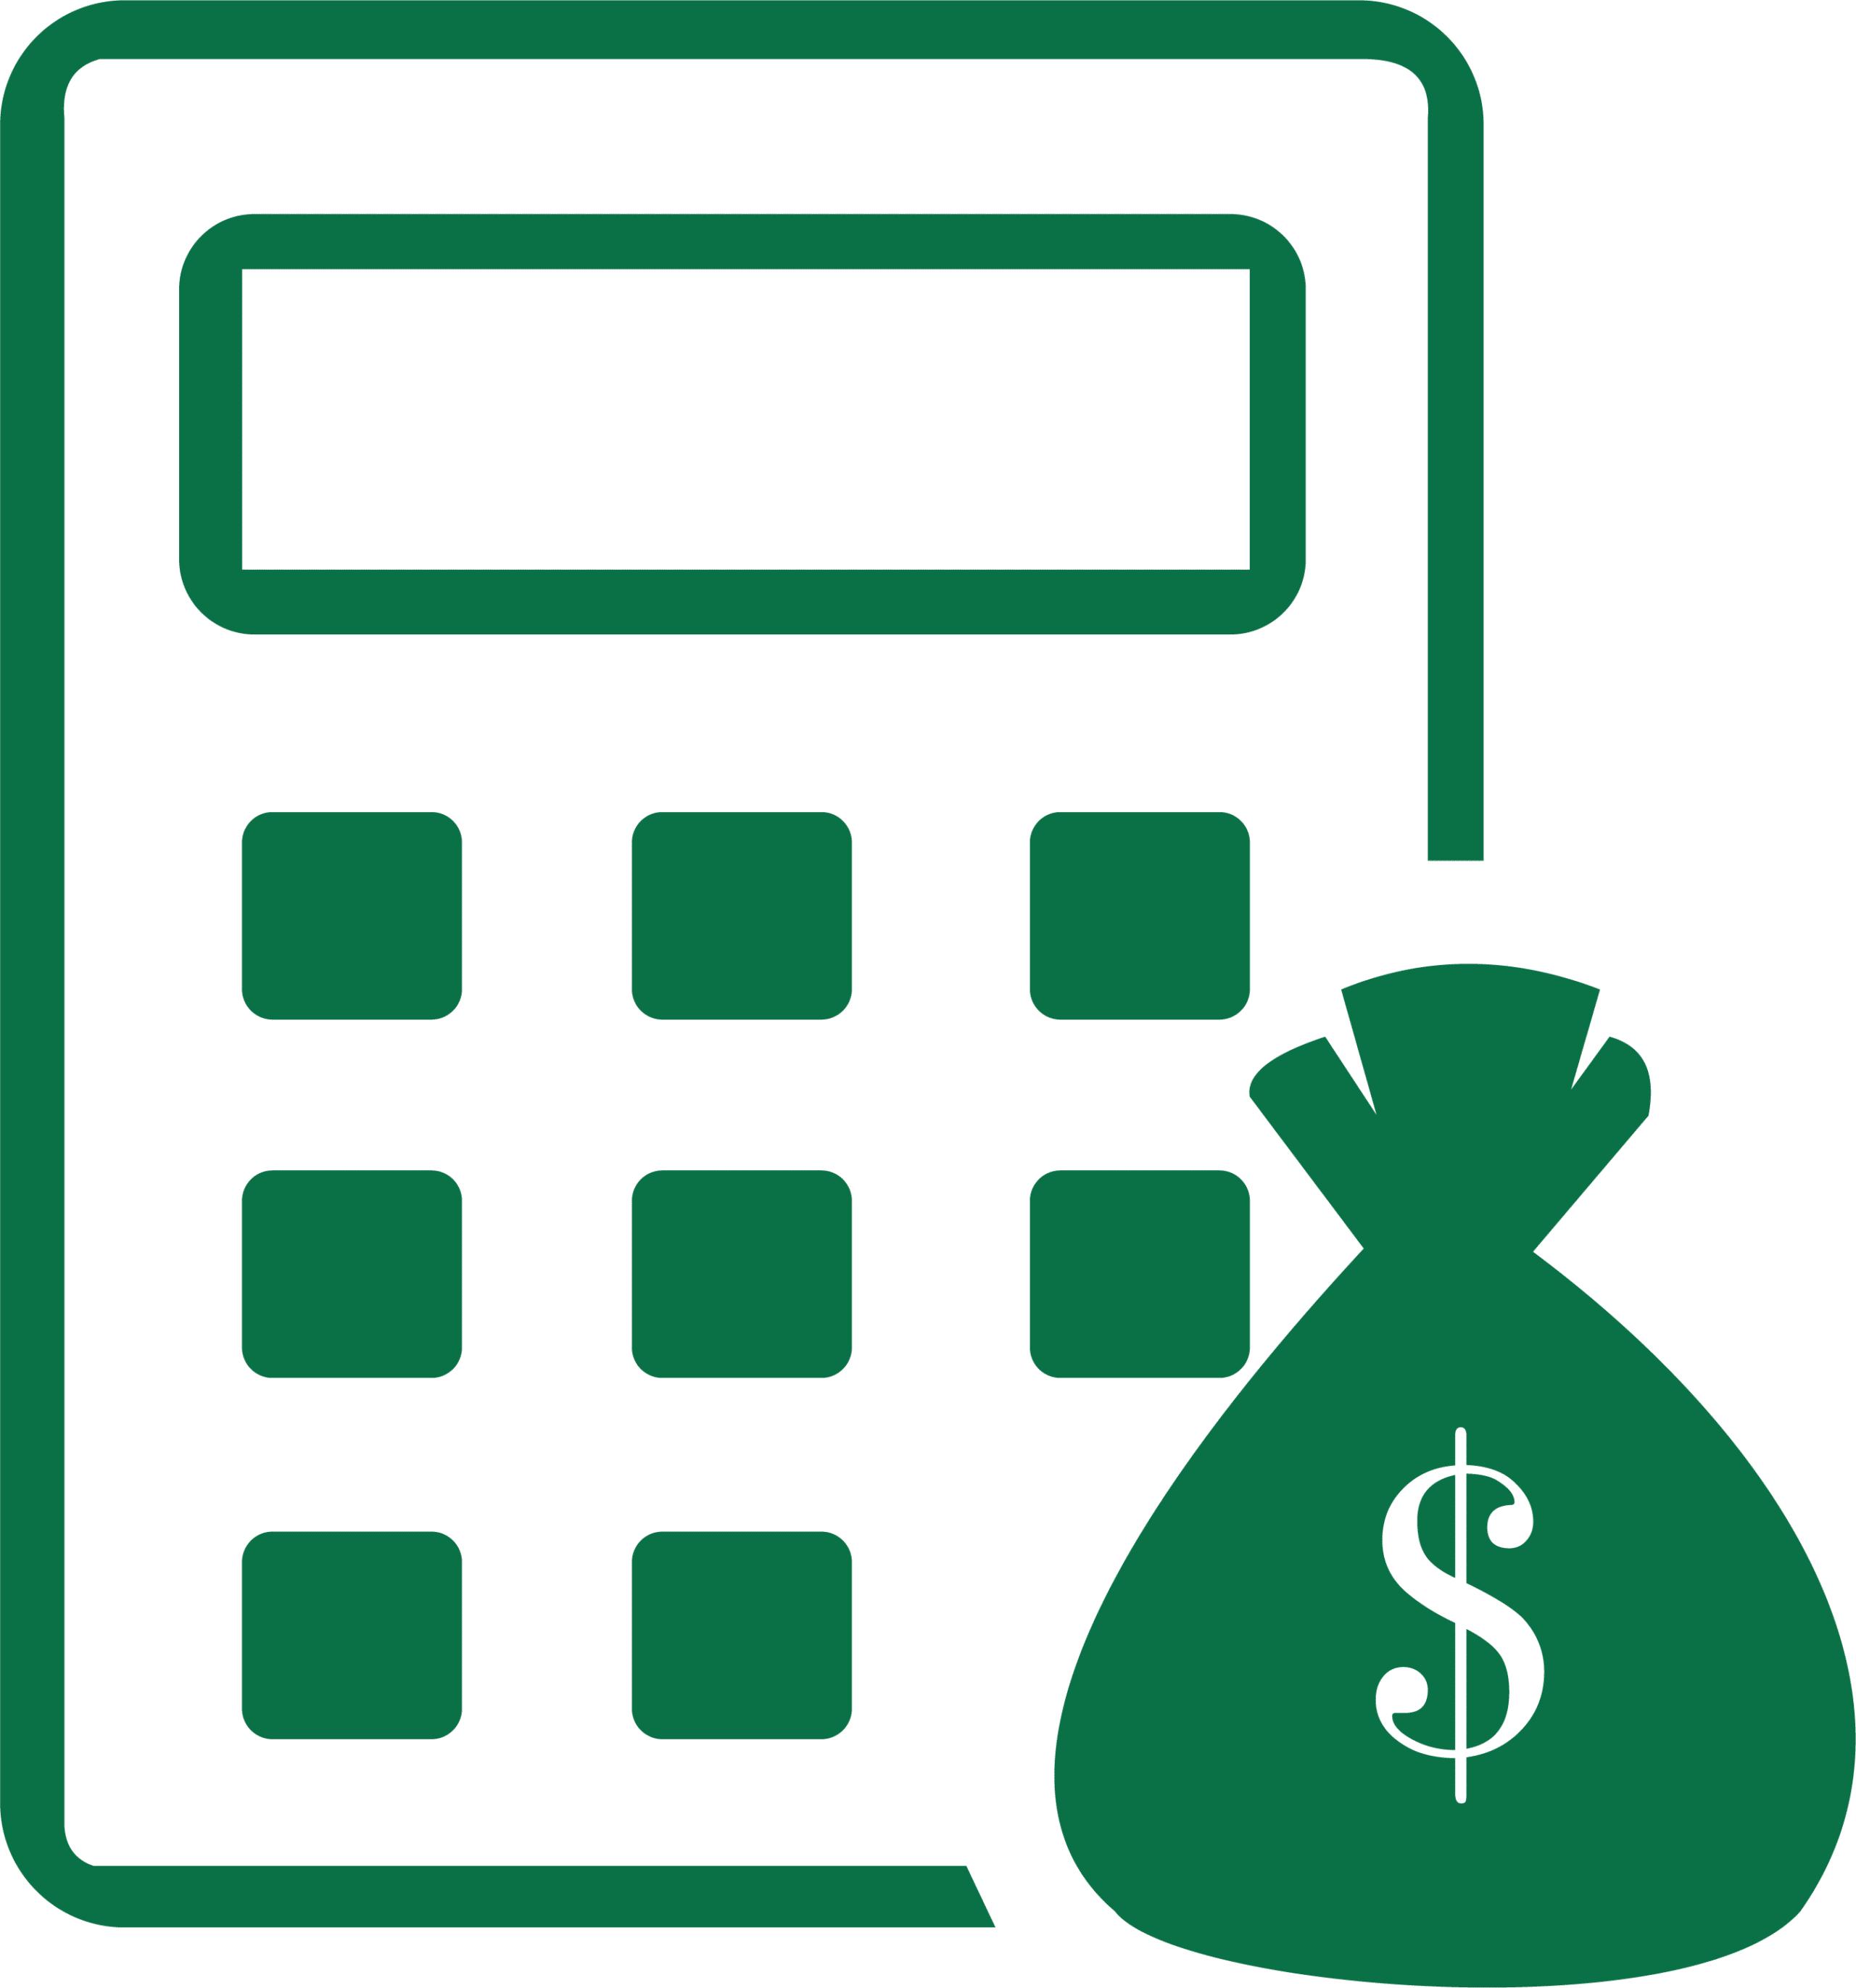 AccountStaff finance professionals graphic - calculator and bag of money graphic